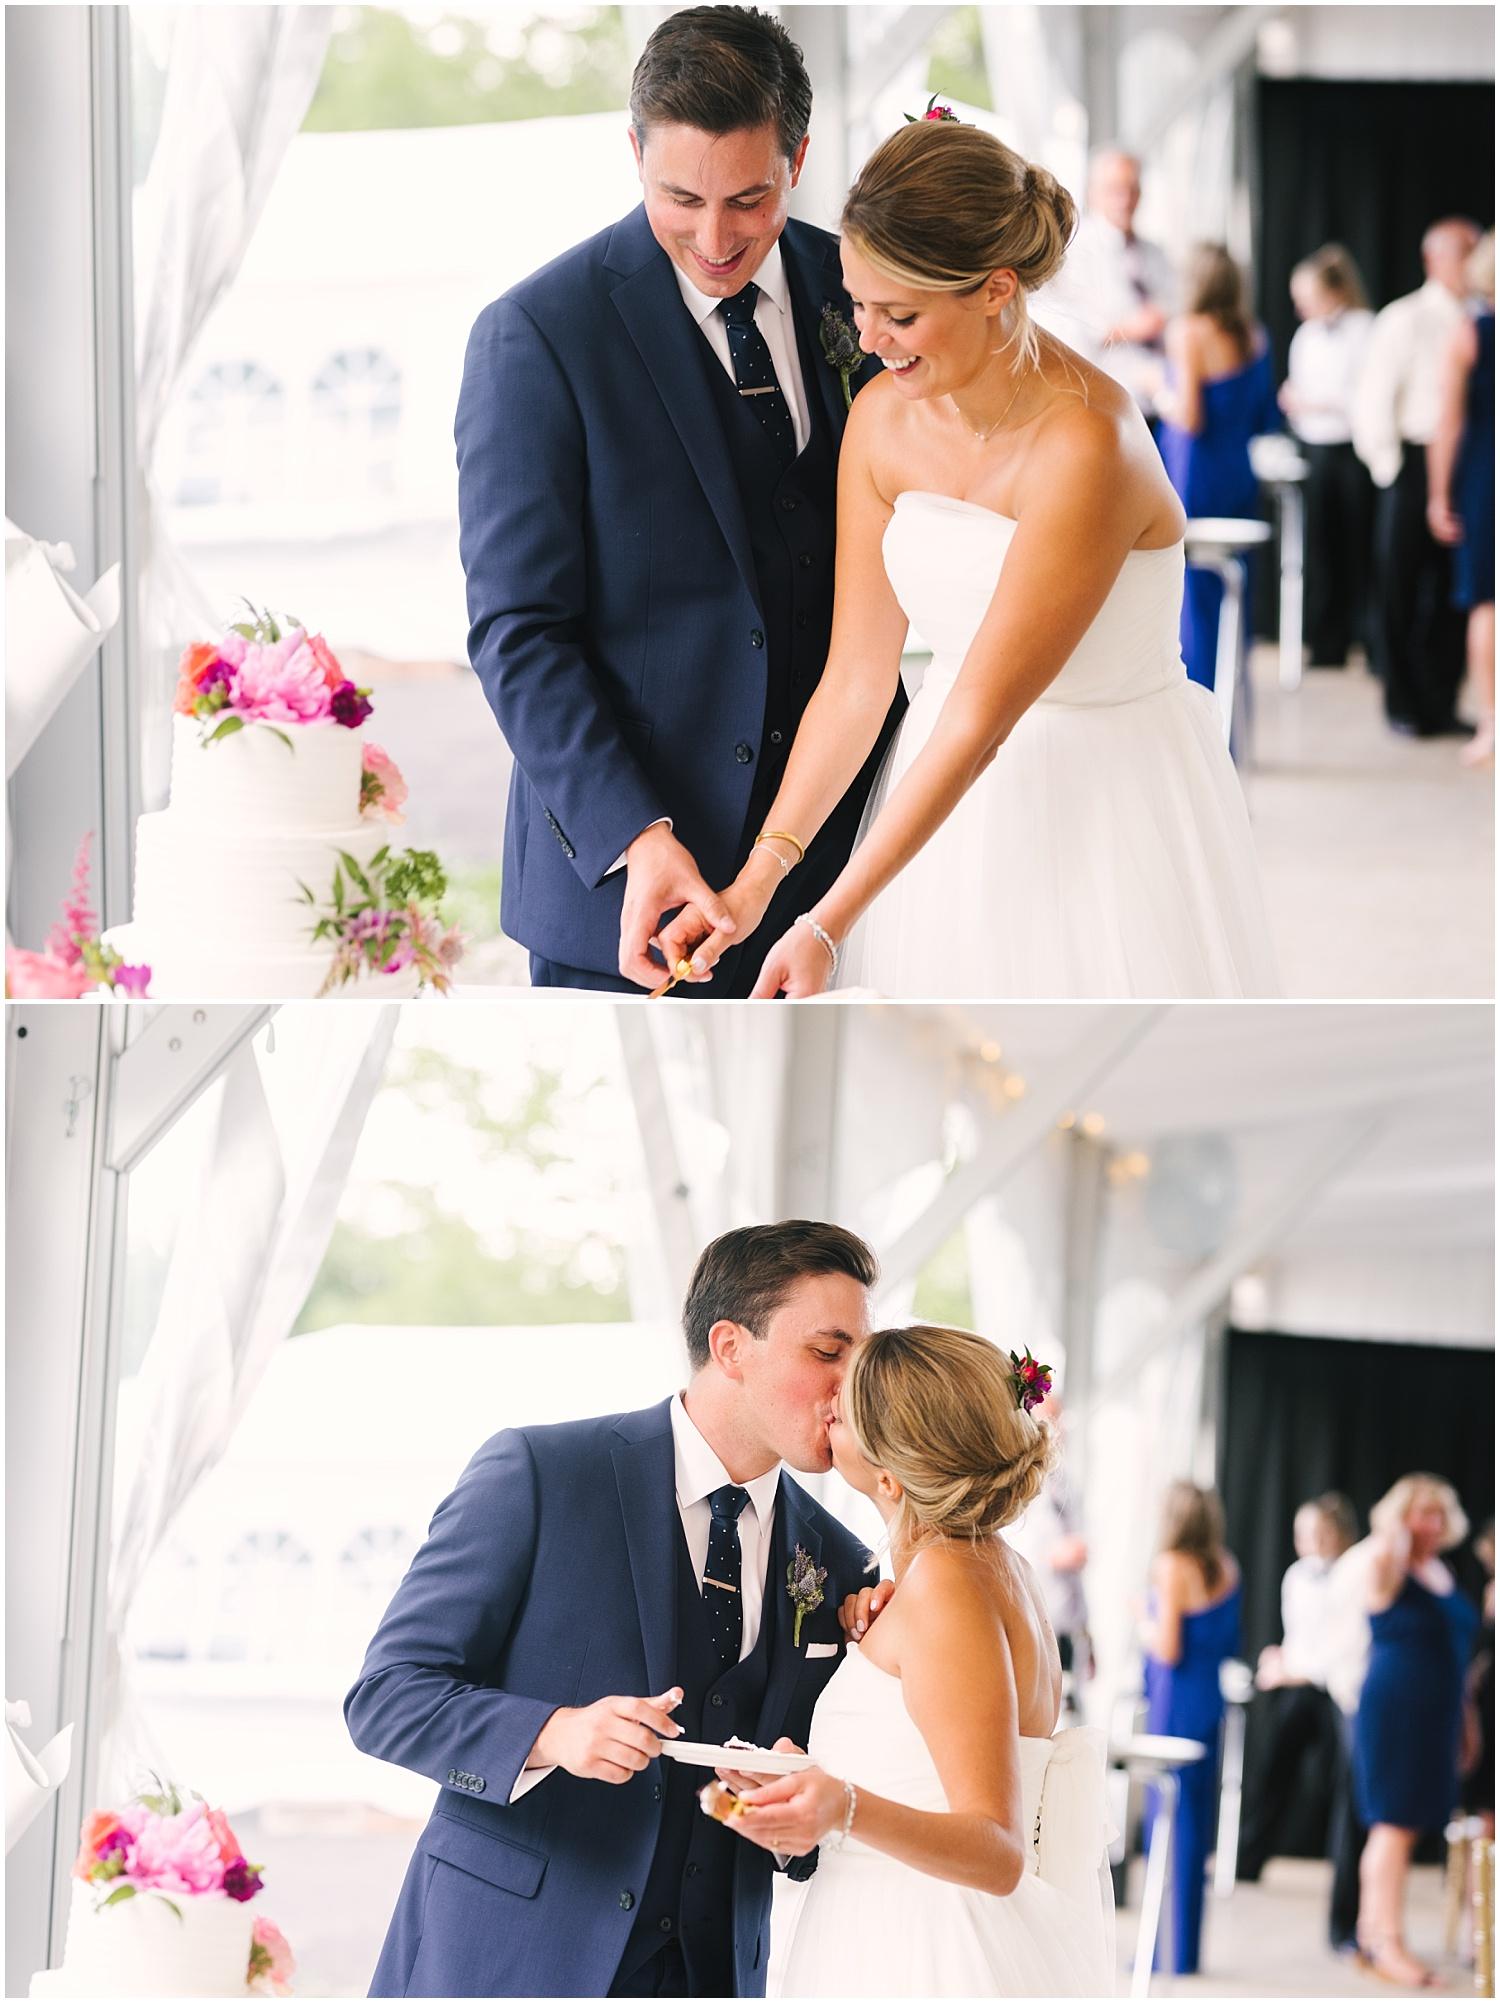 traditions+at+the+glen+wedding+binghamton+wedding (97).jpg